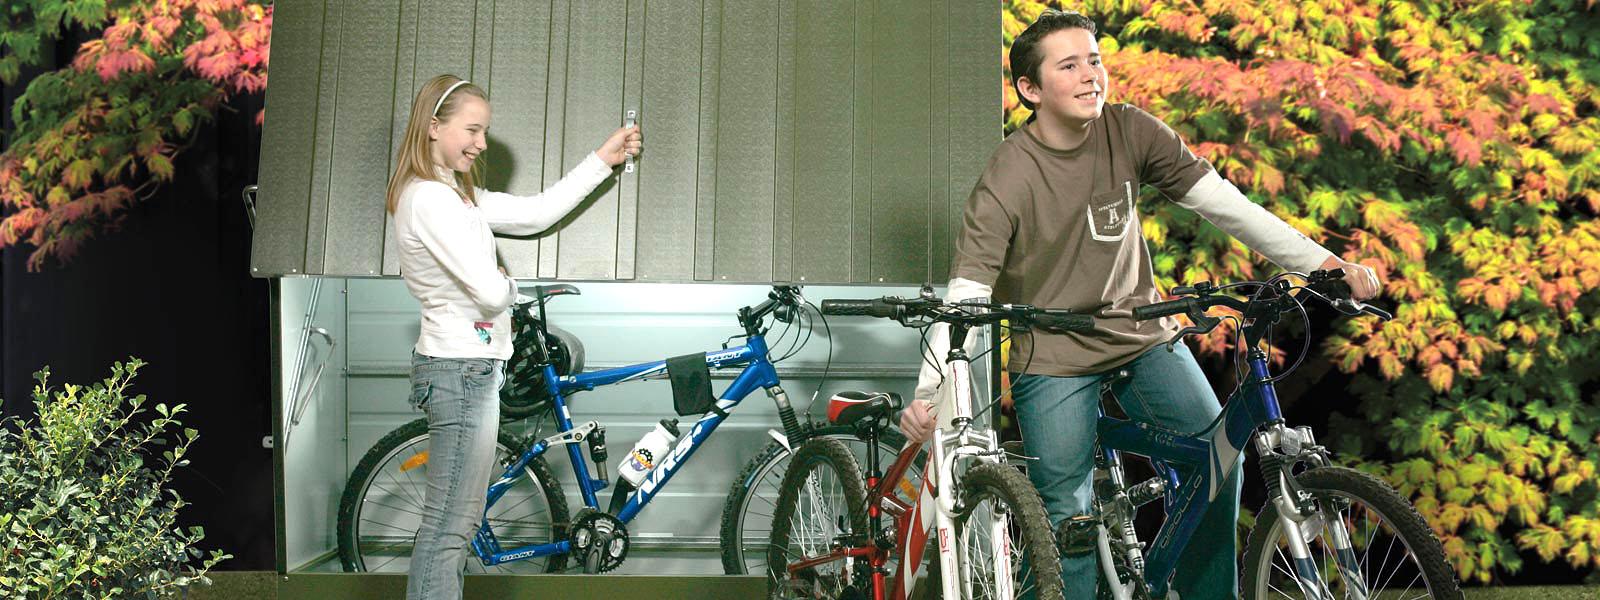 childrens-bike-storage-box